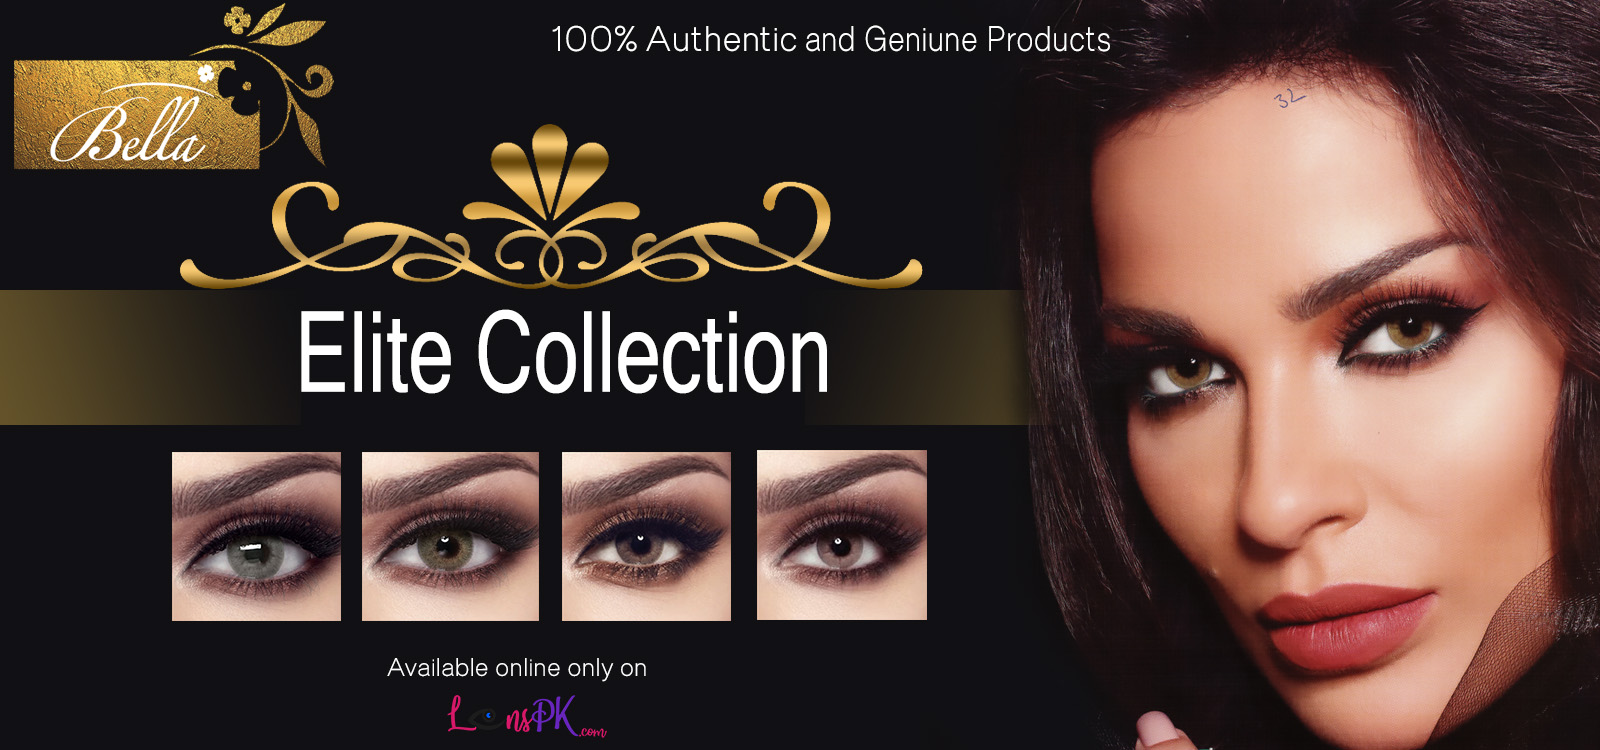 Buy Bella Contact Lenses - Elite Collection - lenspk.com